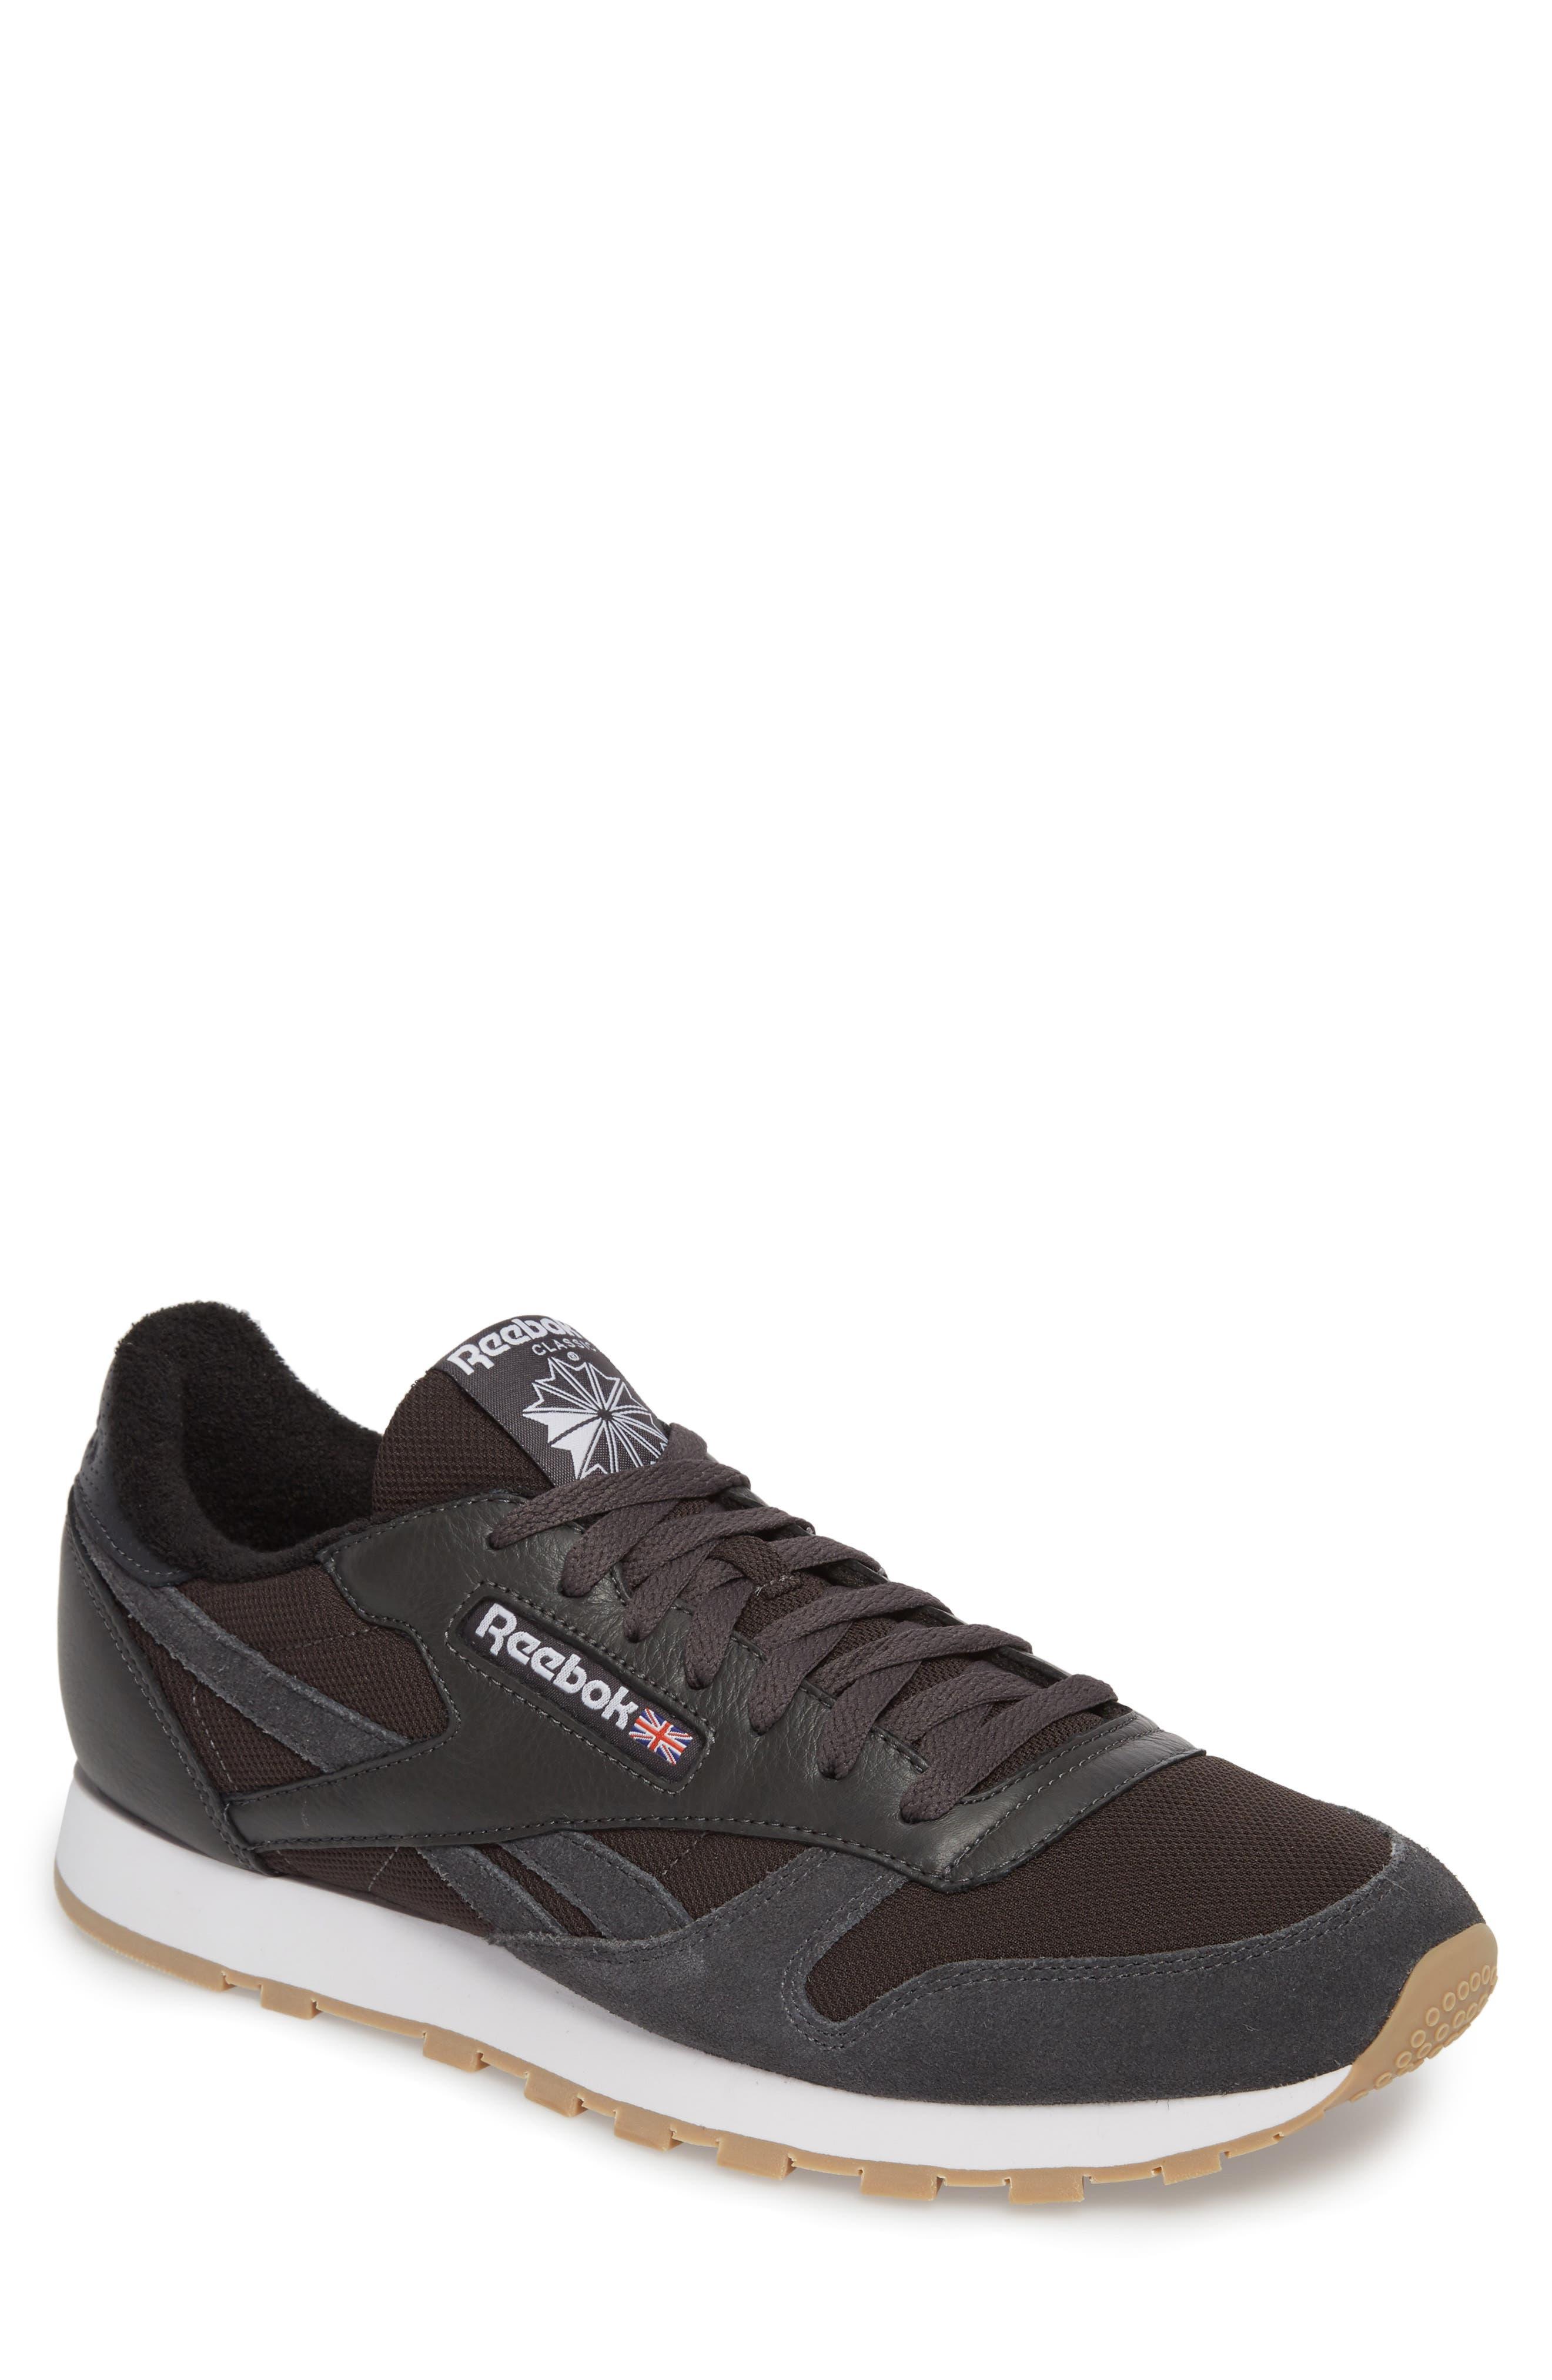 ESTL Classic Leather Sneaker,                             Main thumbnail 1, color,                             Coal/ White/ Washed Blue